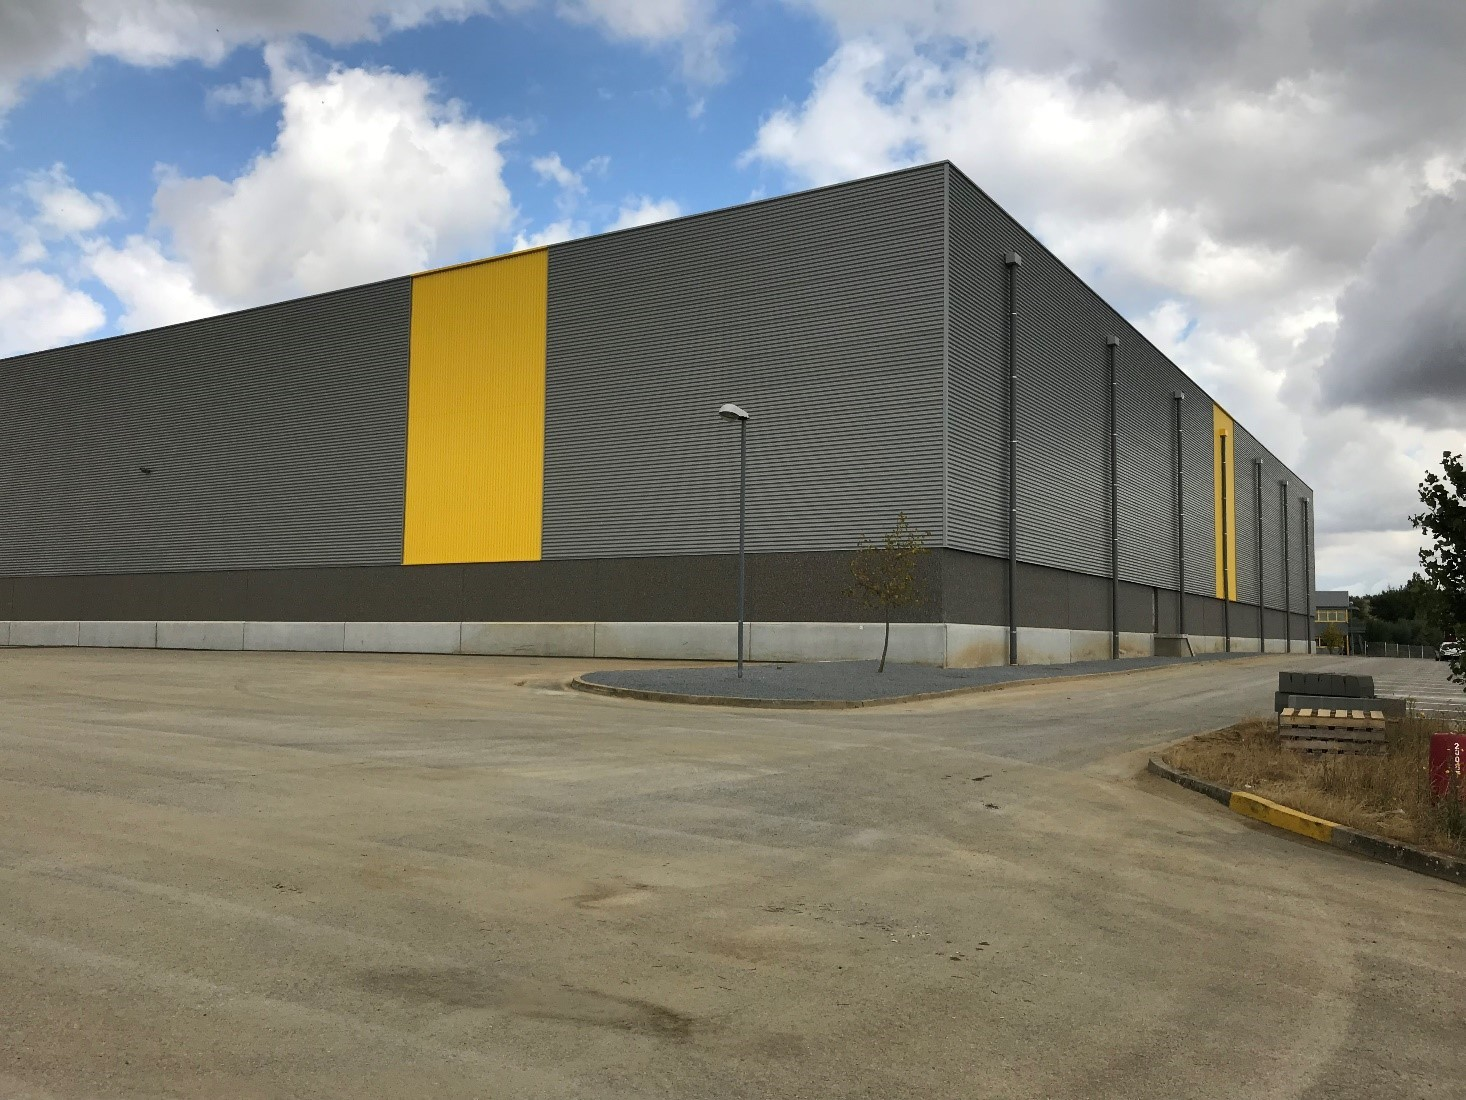 Construction entrepôt logistique Hauts de France De Rijke